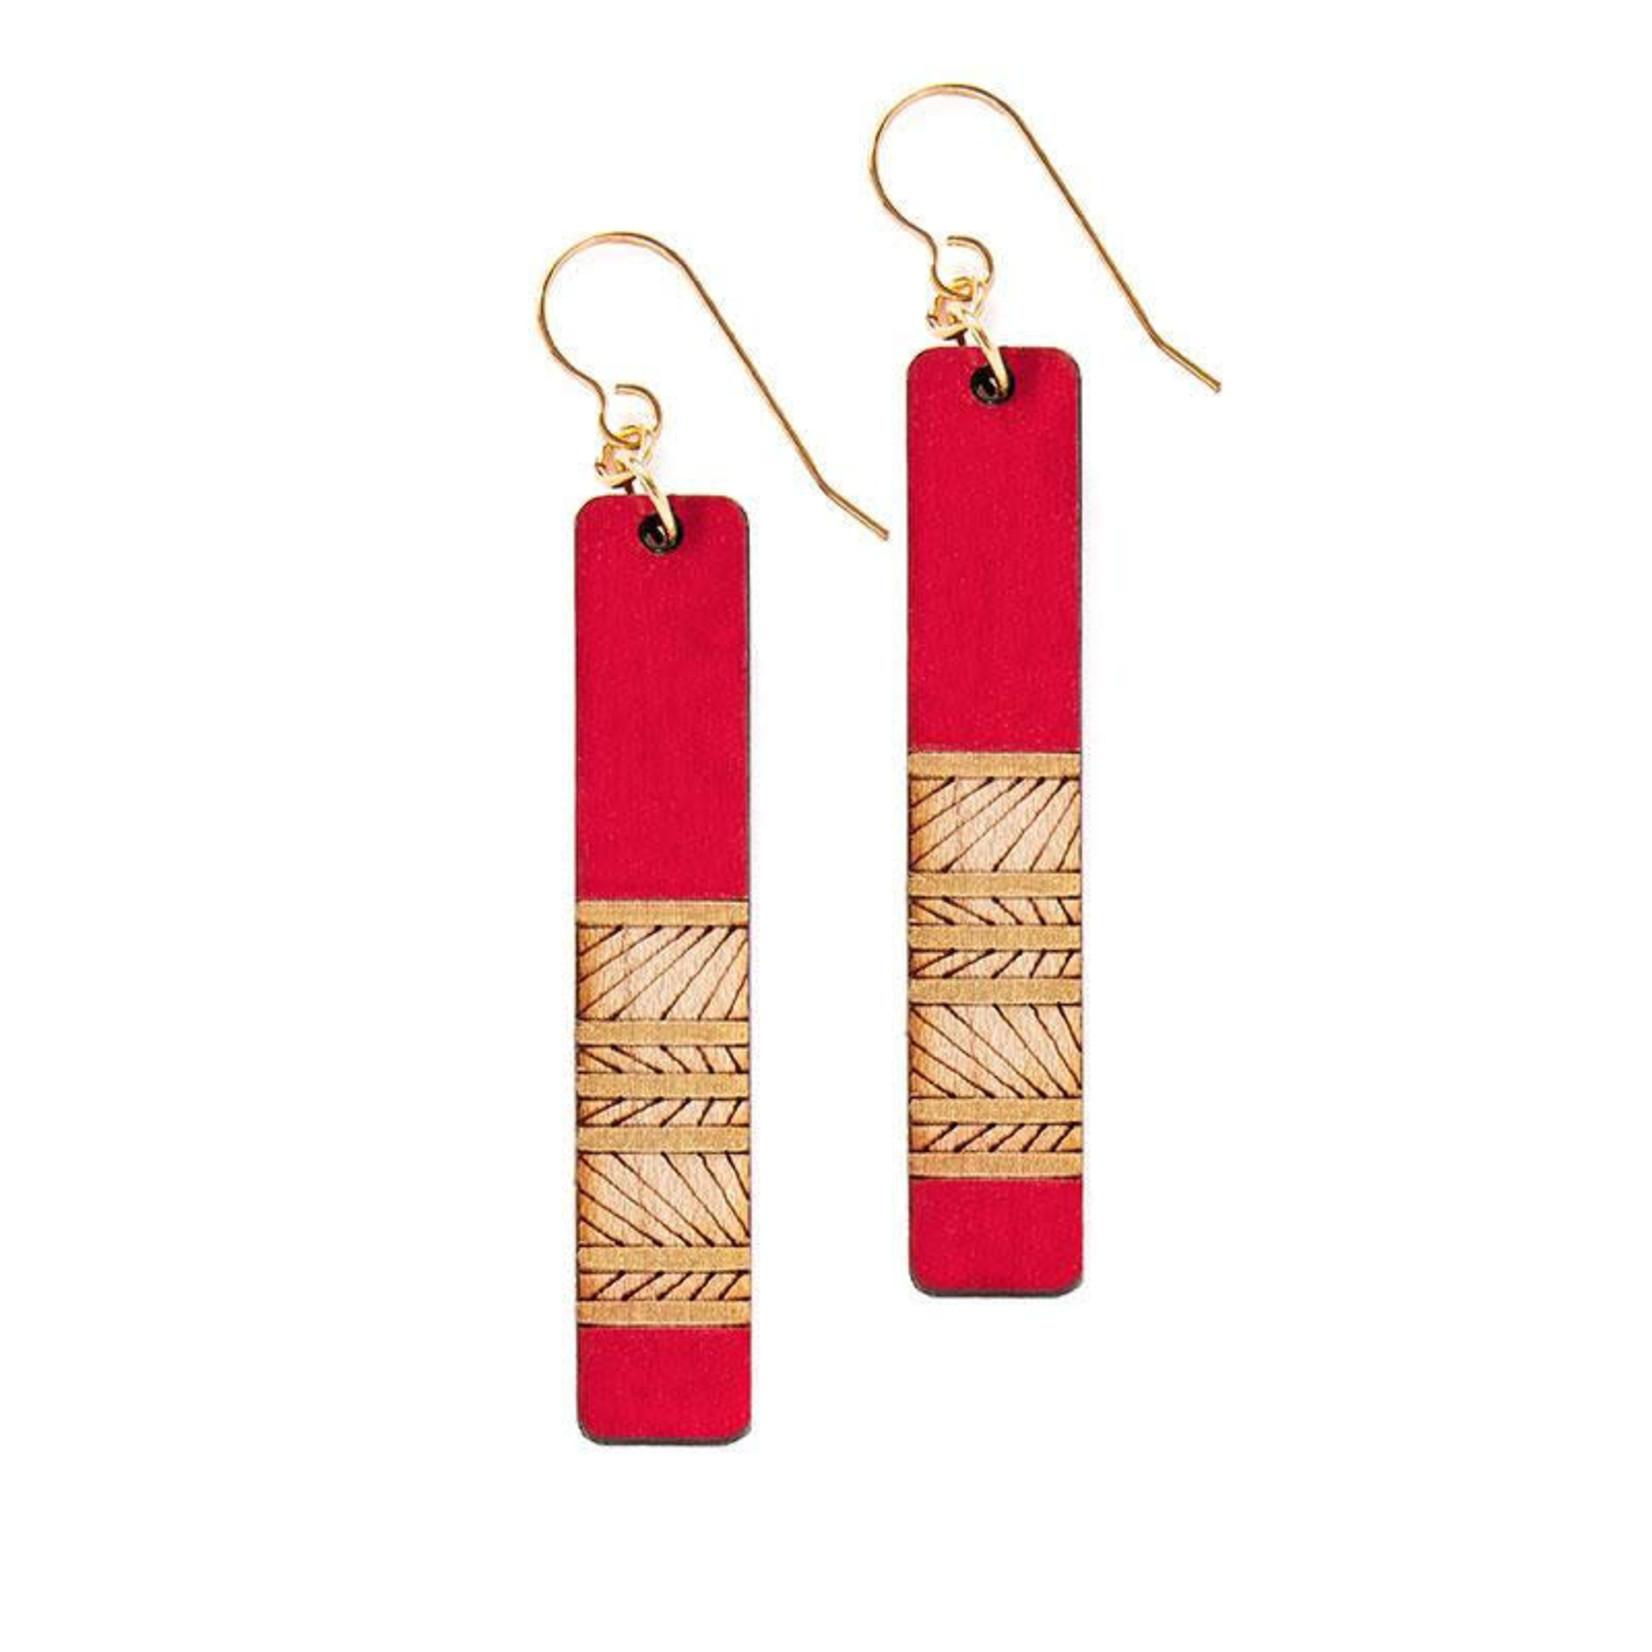 TREELINE AND TIDE LINES LONG EARRINGS - RED